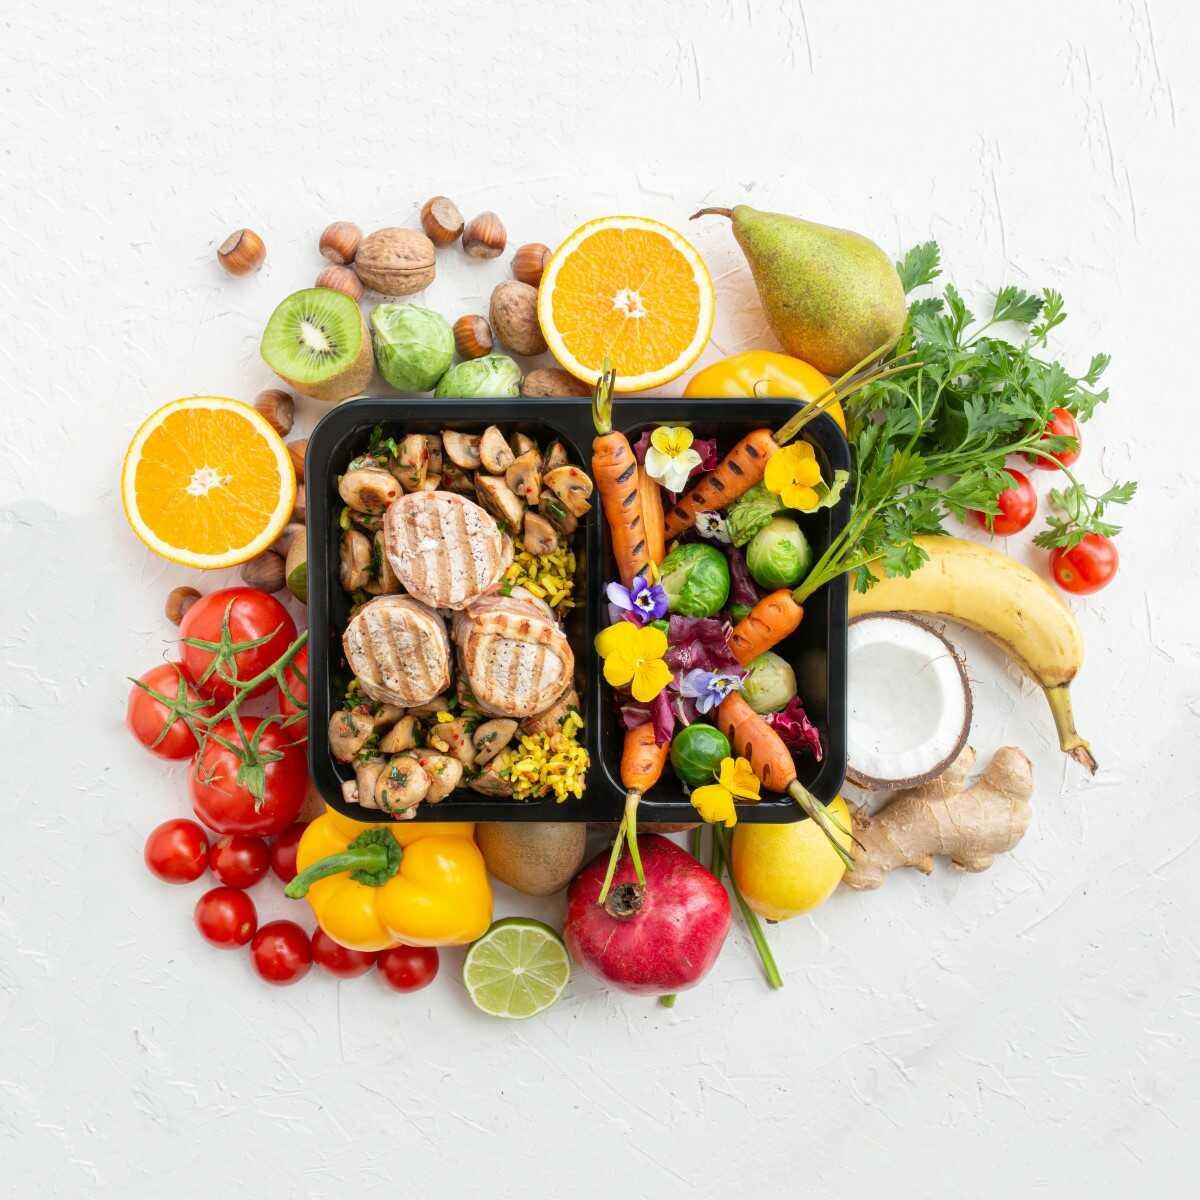 wygodna-dieta-catering-dietetycznyjpg